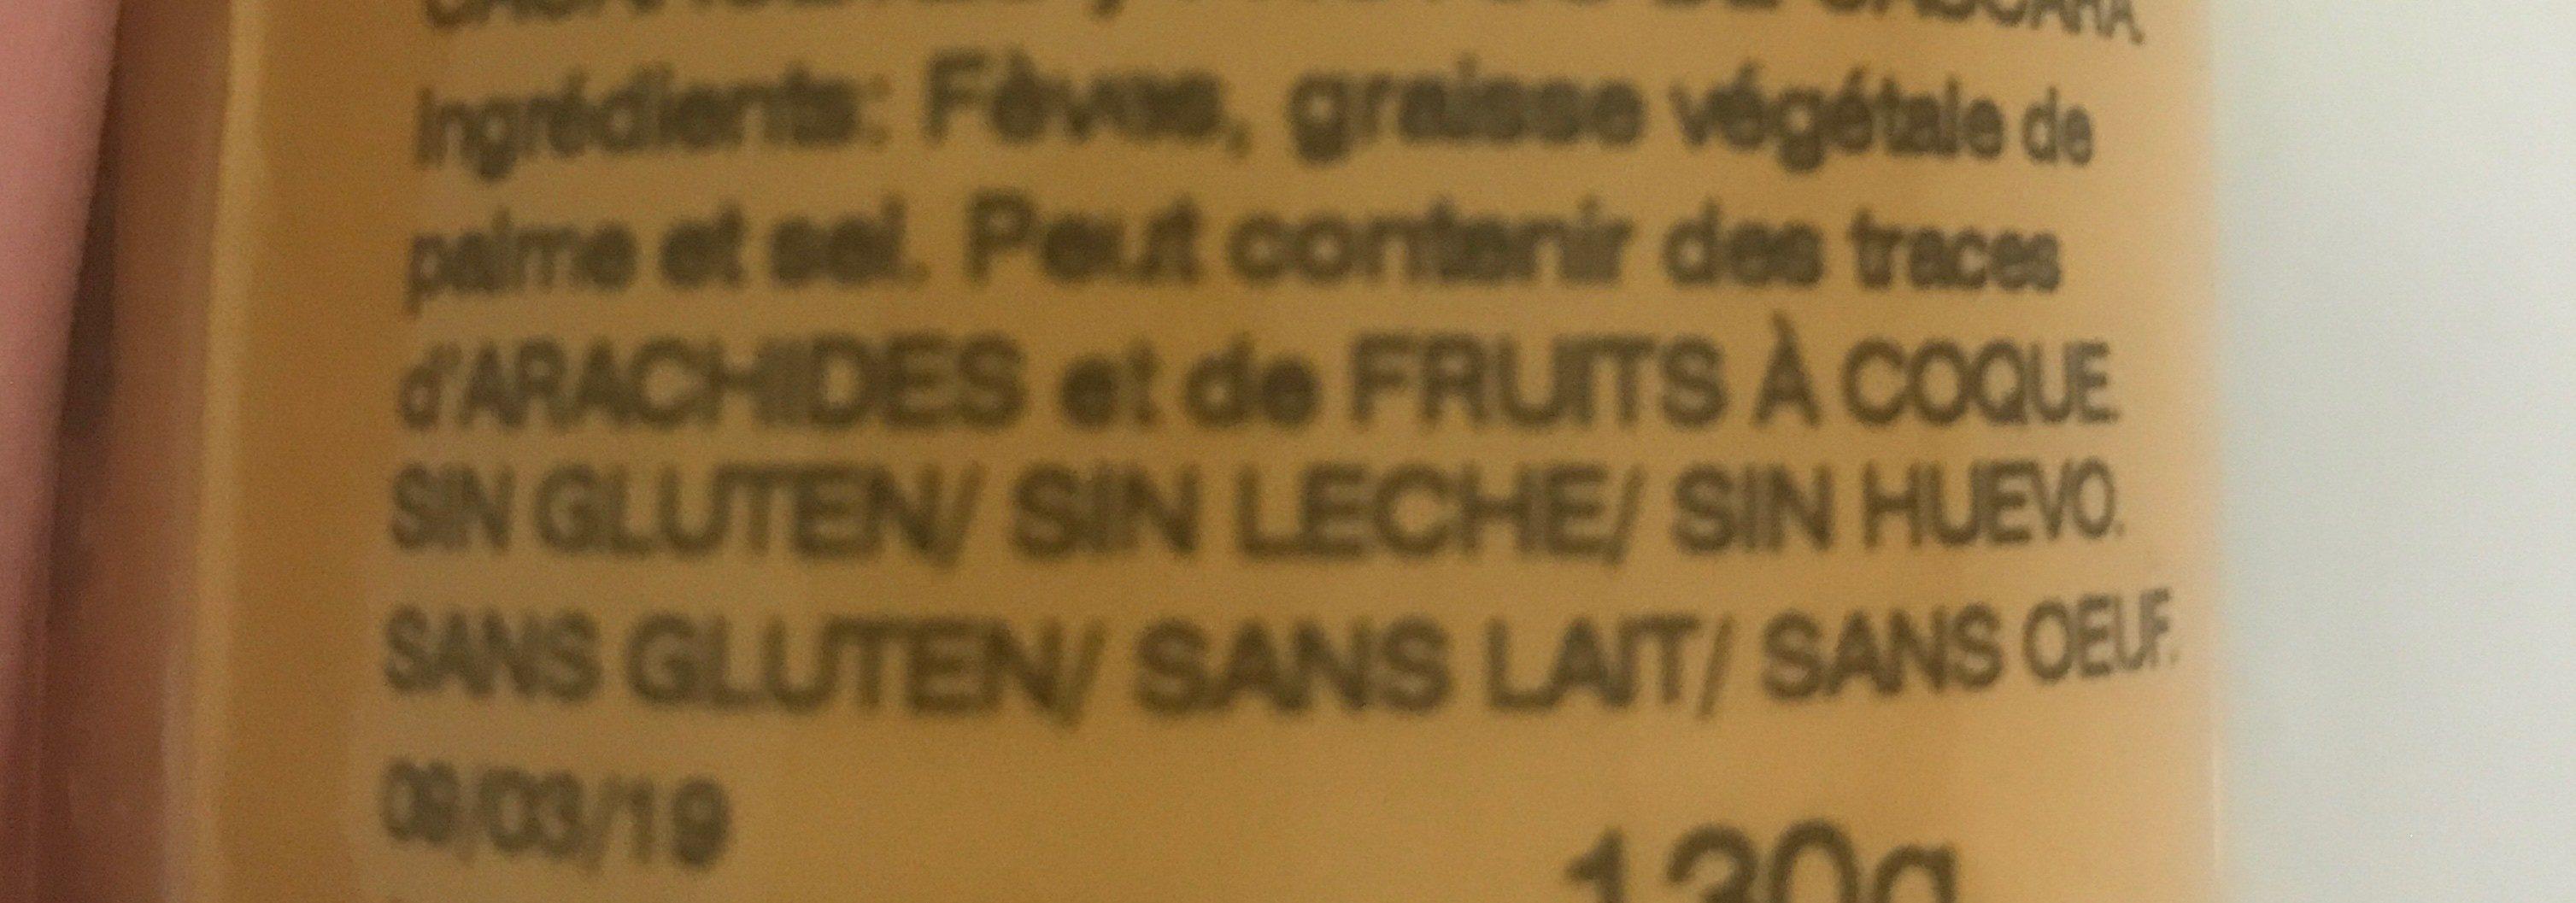 Faves Frit Ravich - Ingredientes - fr